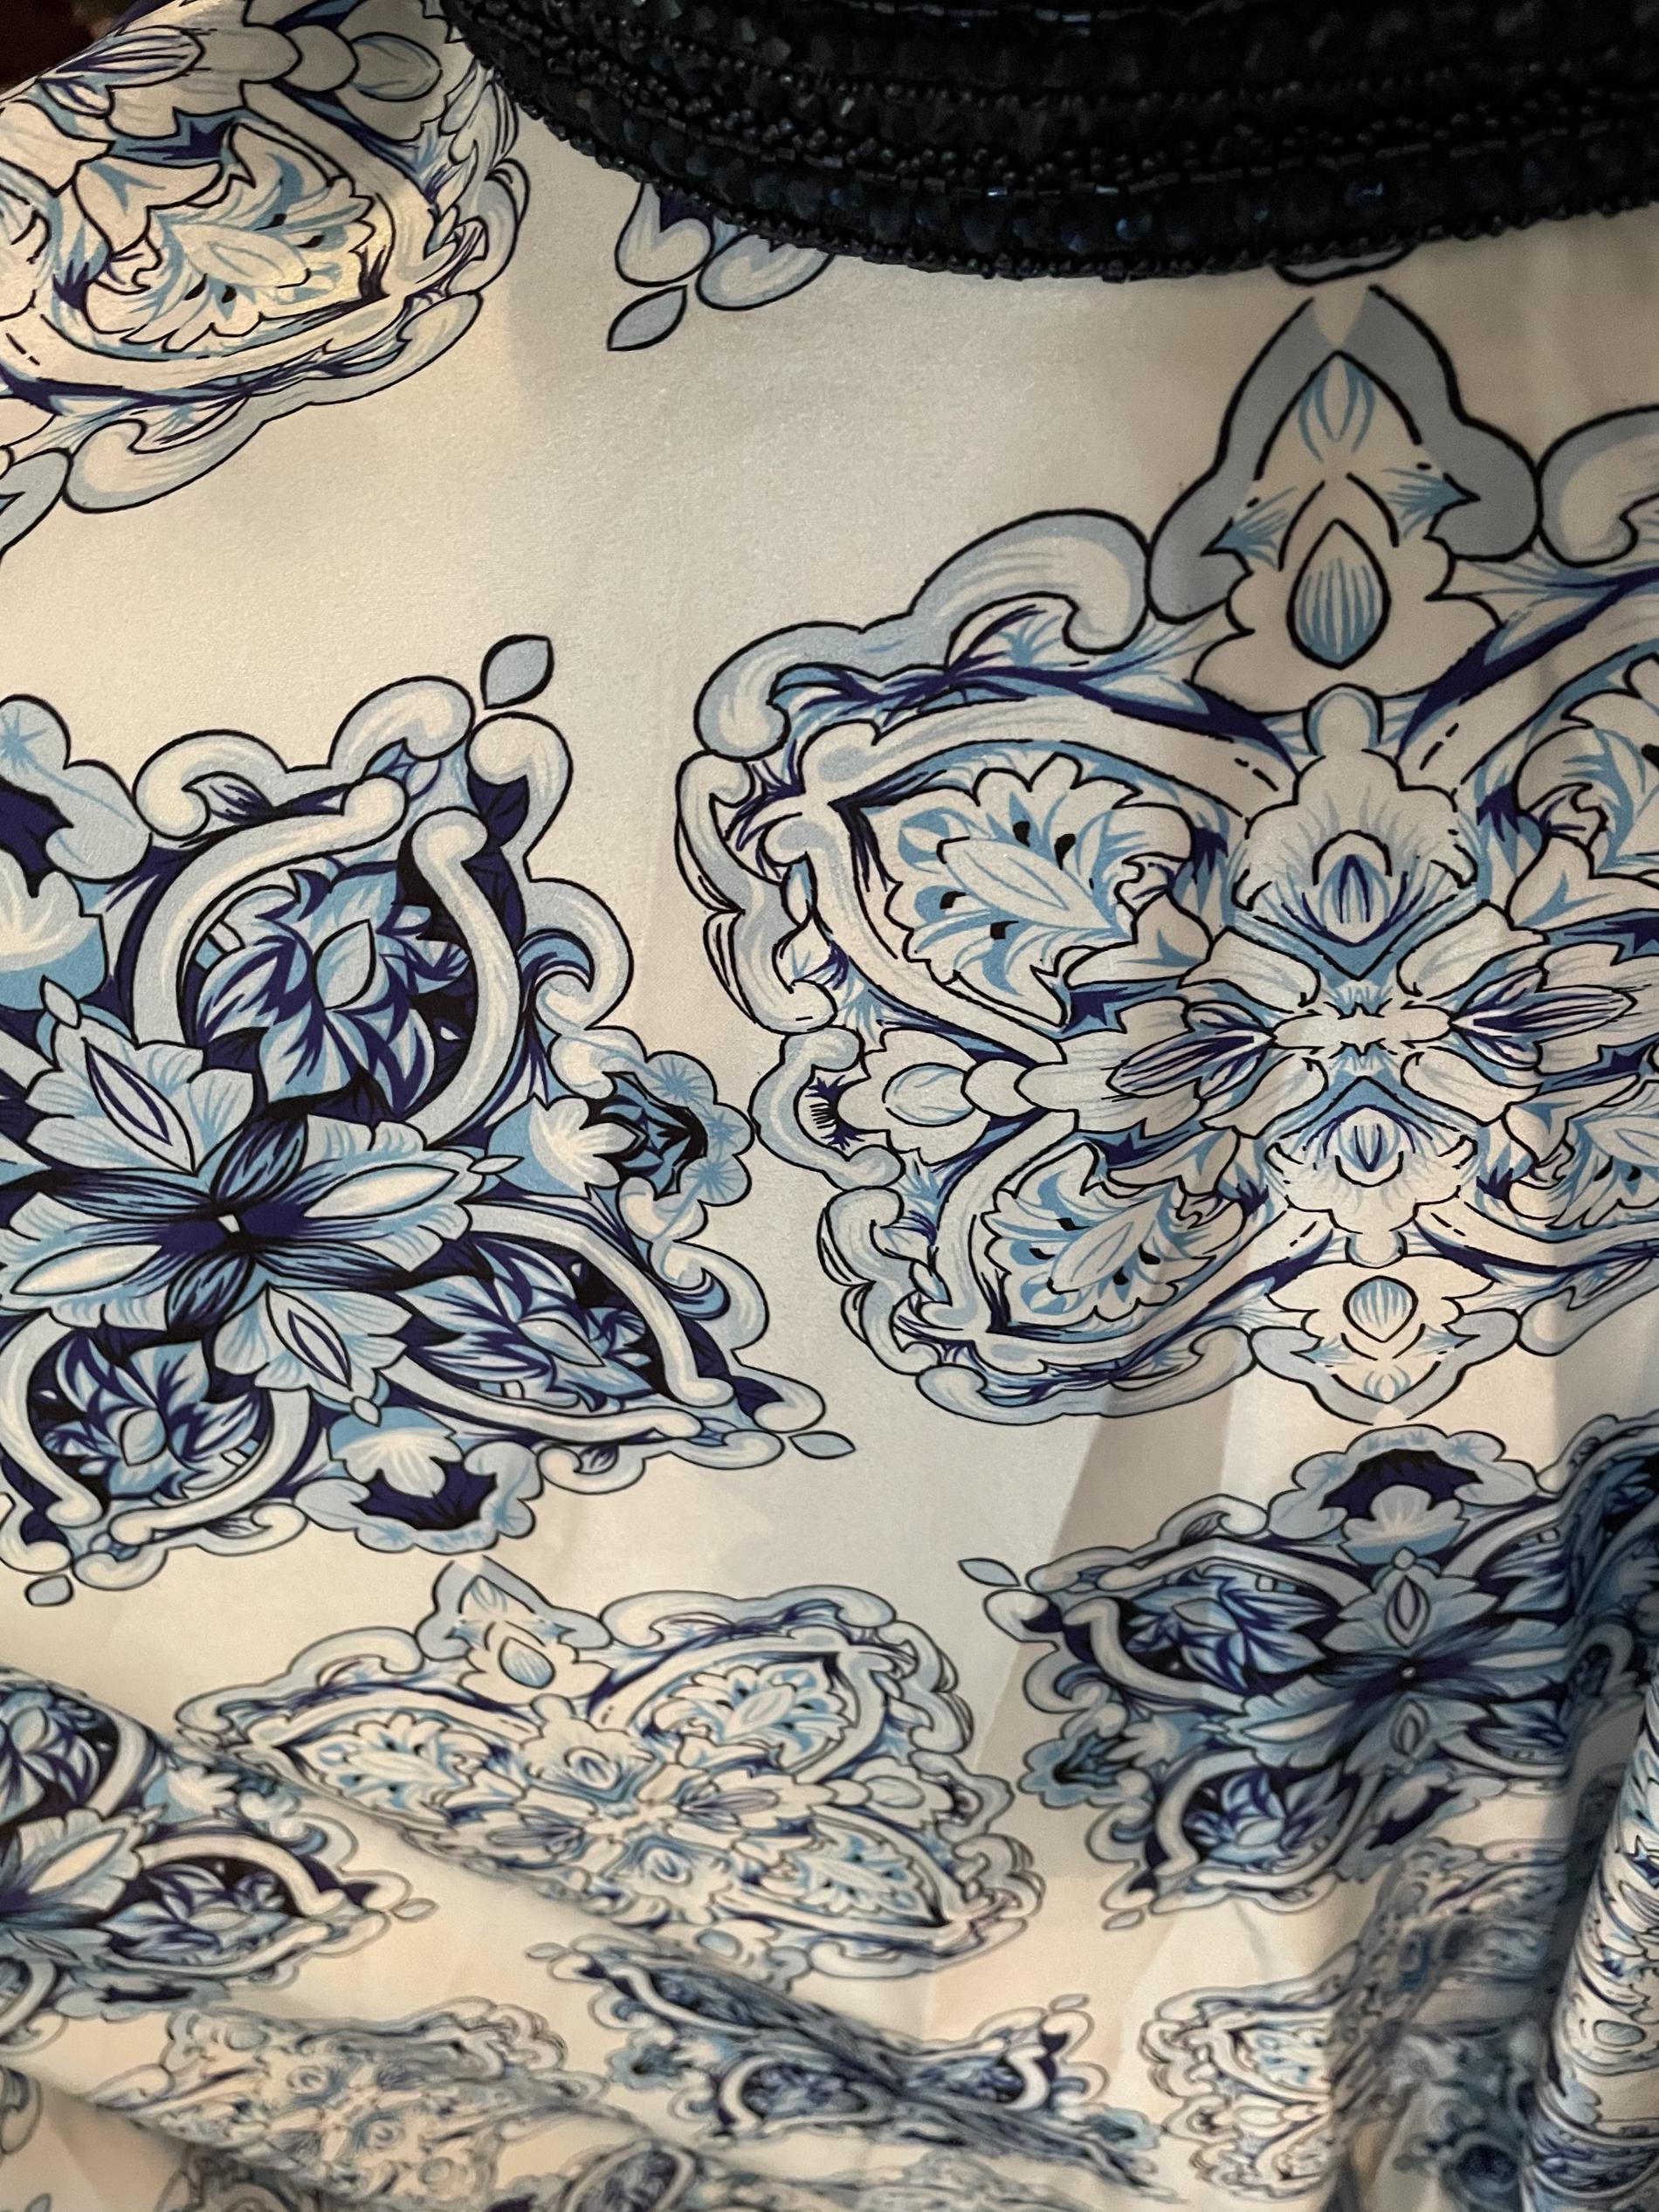 Camille La Vie Blue Size 4 Floral Train Dress on Queenly